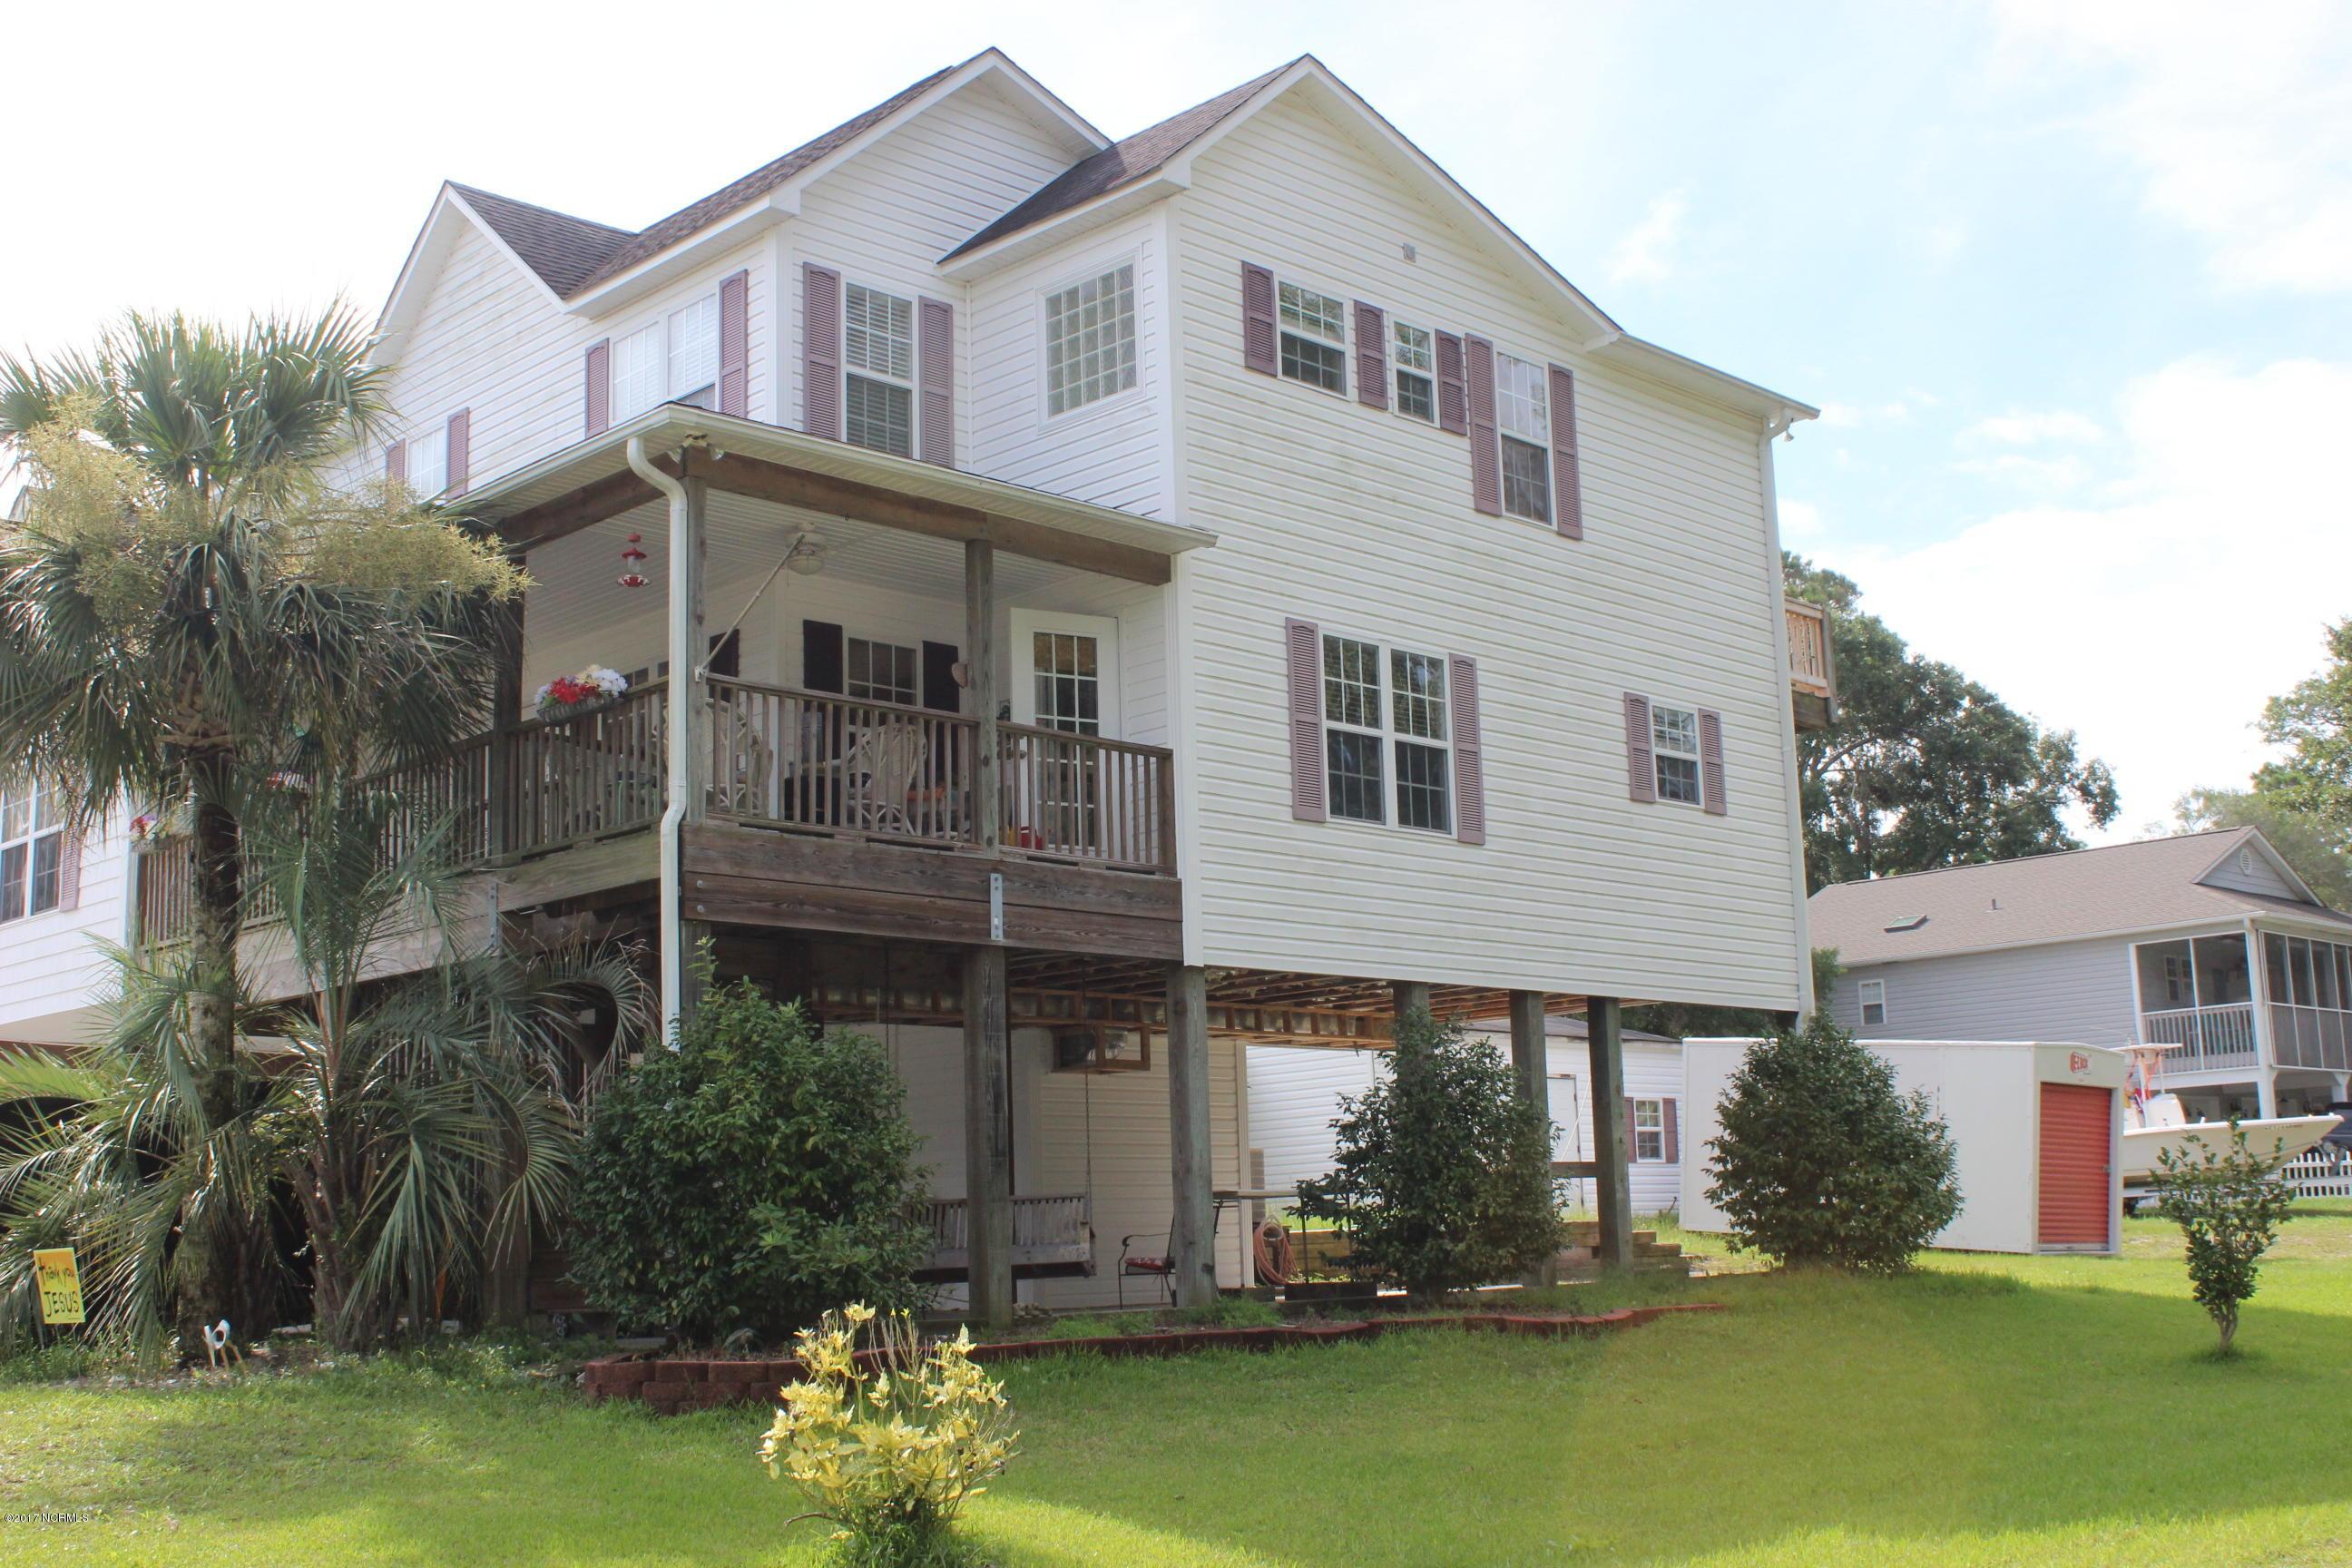 Carolina Plantations Real Estate - MLS Number: 100077710